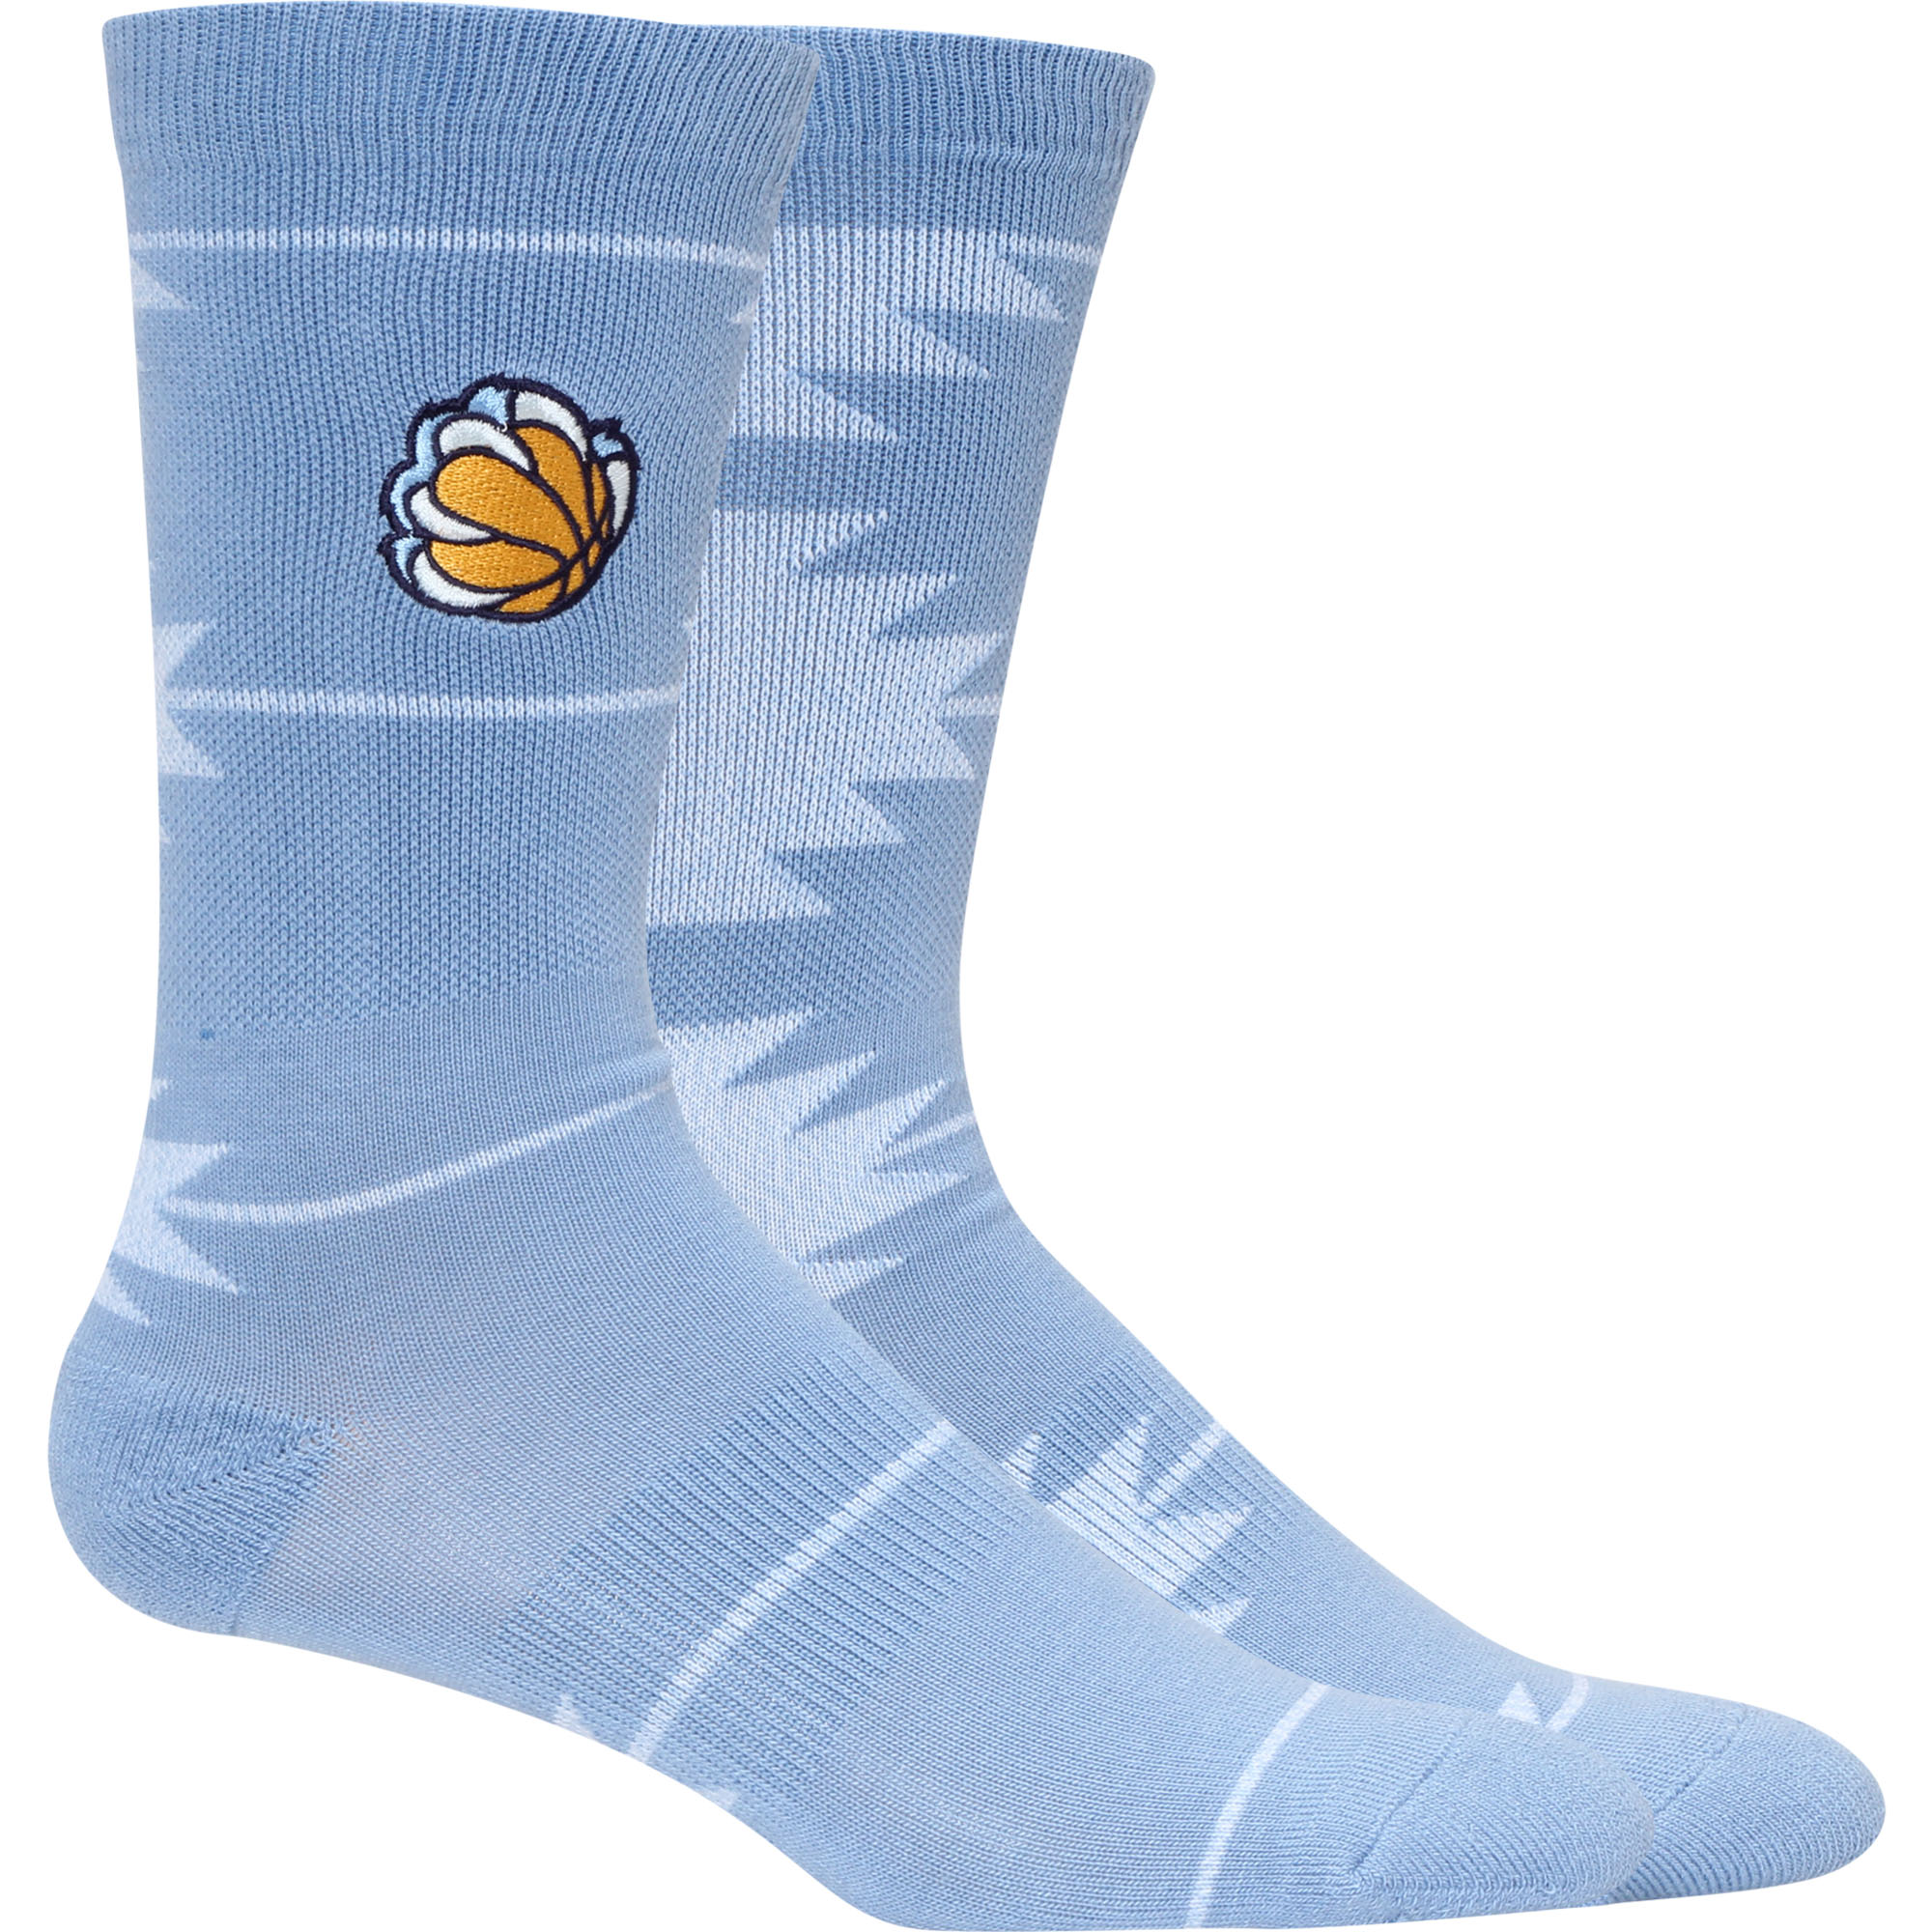 Memphis Grizzlies Geo Crew Socks - L